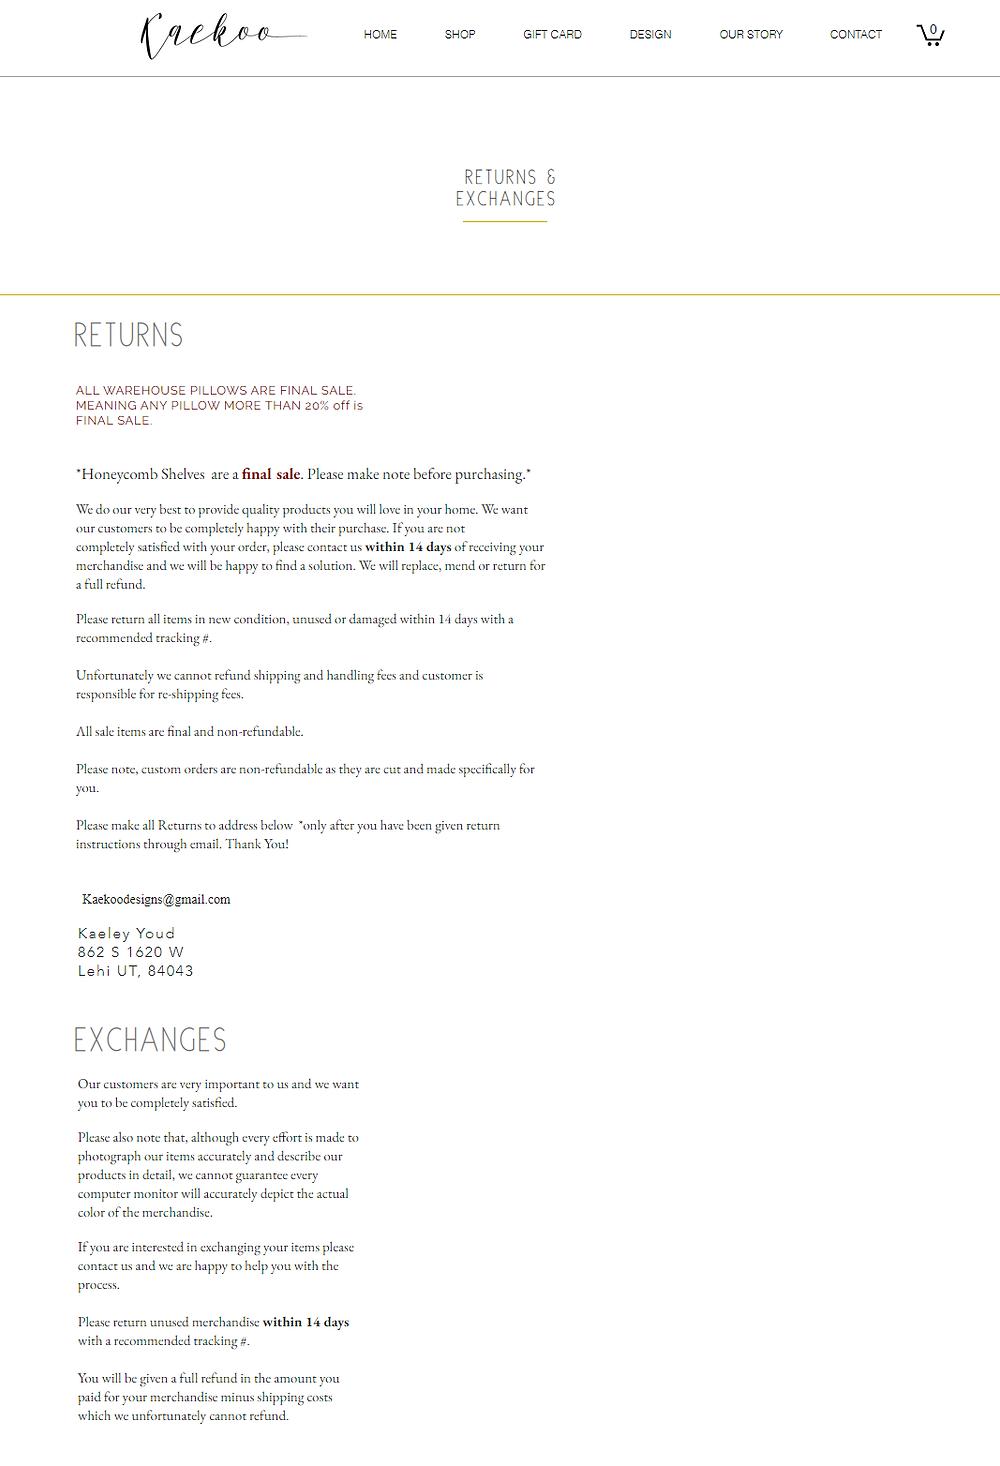 Kaekoo return and refund policy